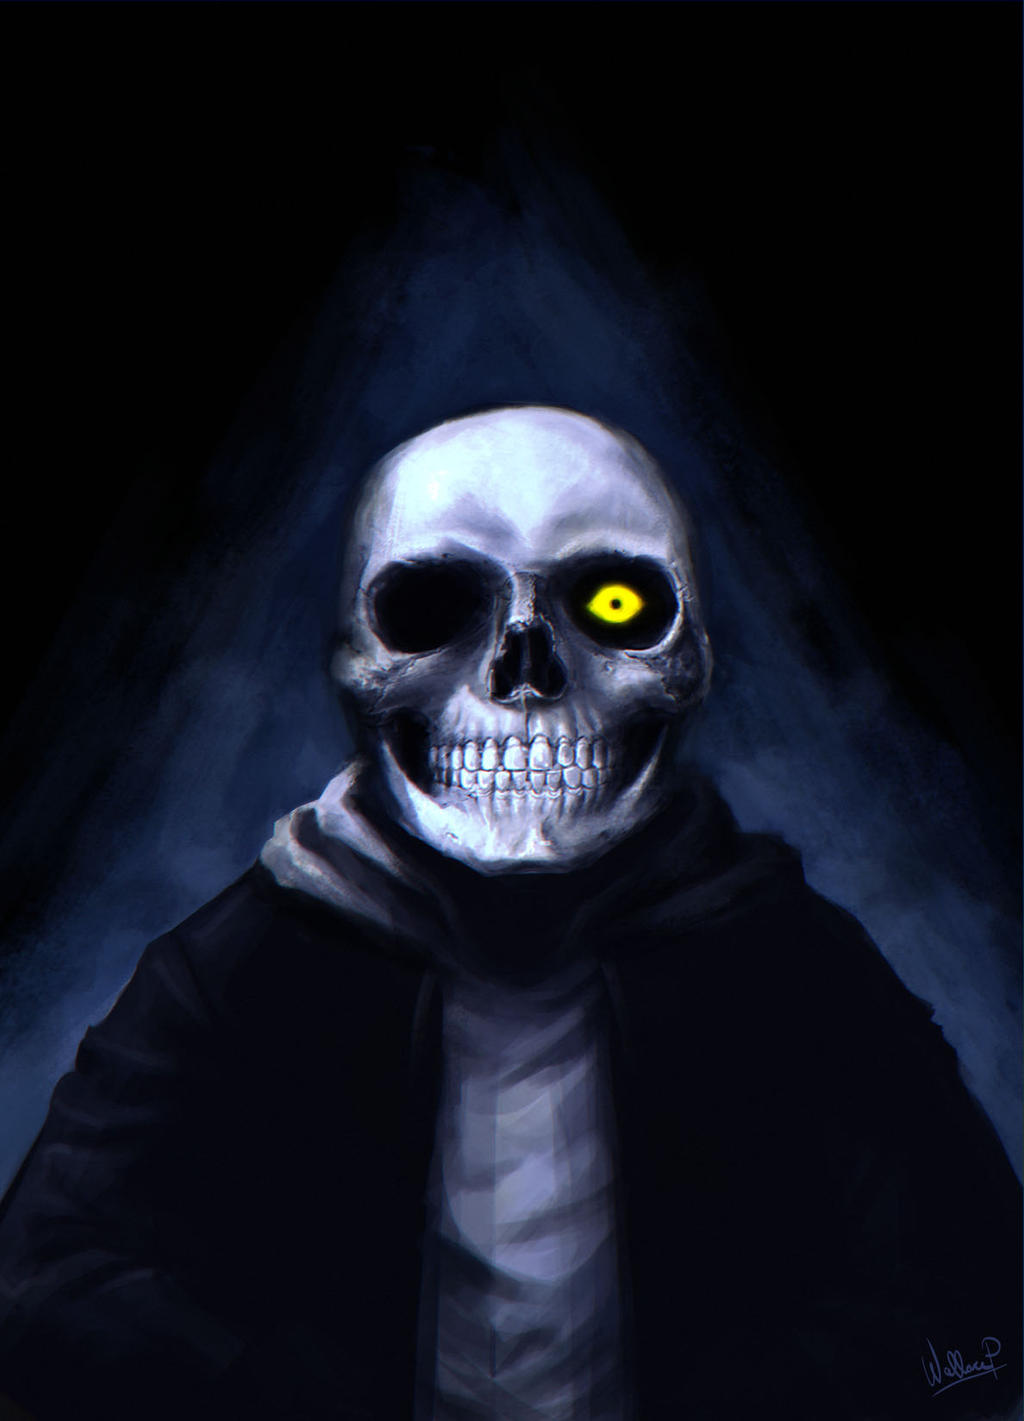 Spooky Scary Skeletons by SatsuiNoHado